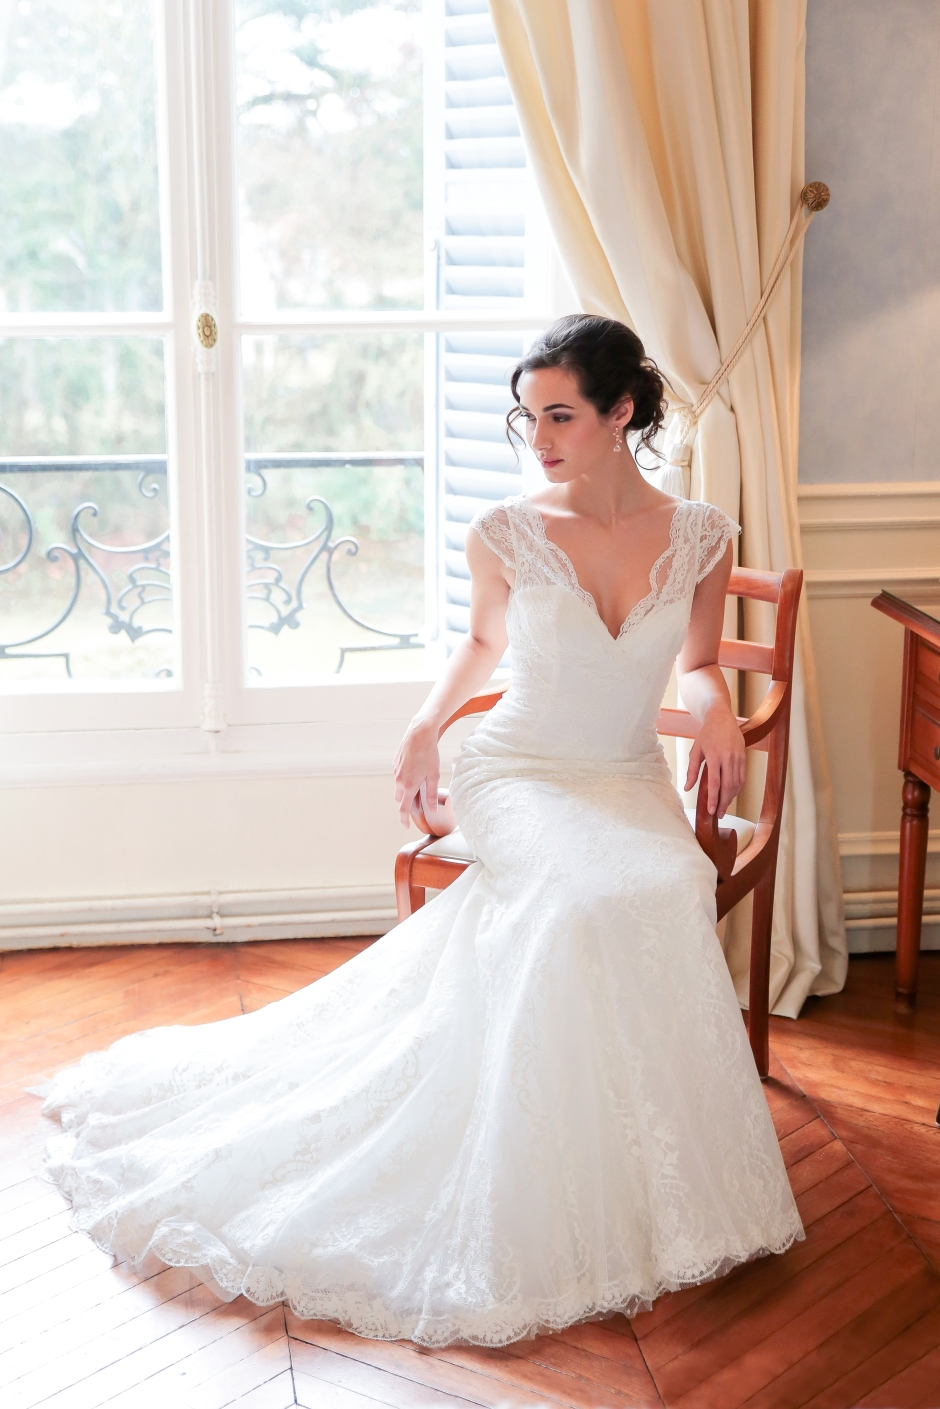 Mariage nude au Chateau de Santeny - La Blogueuse Mariage (12)